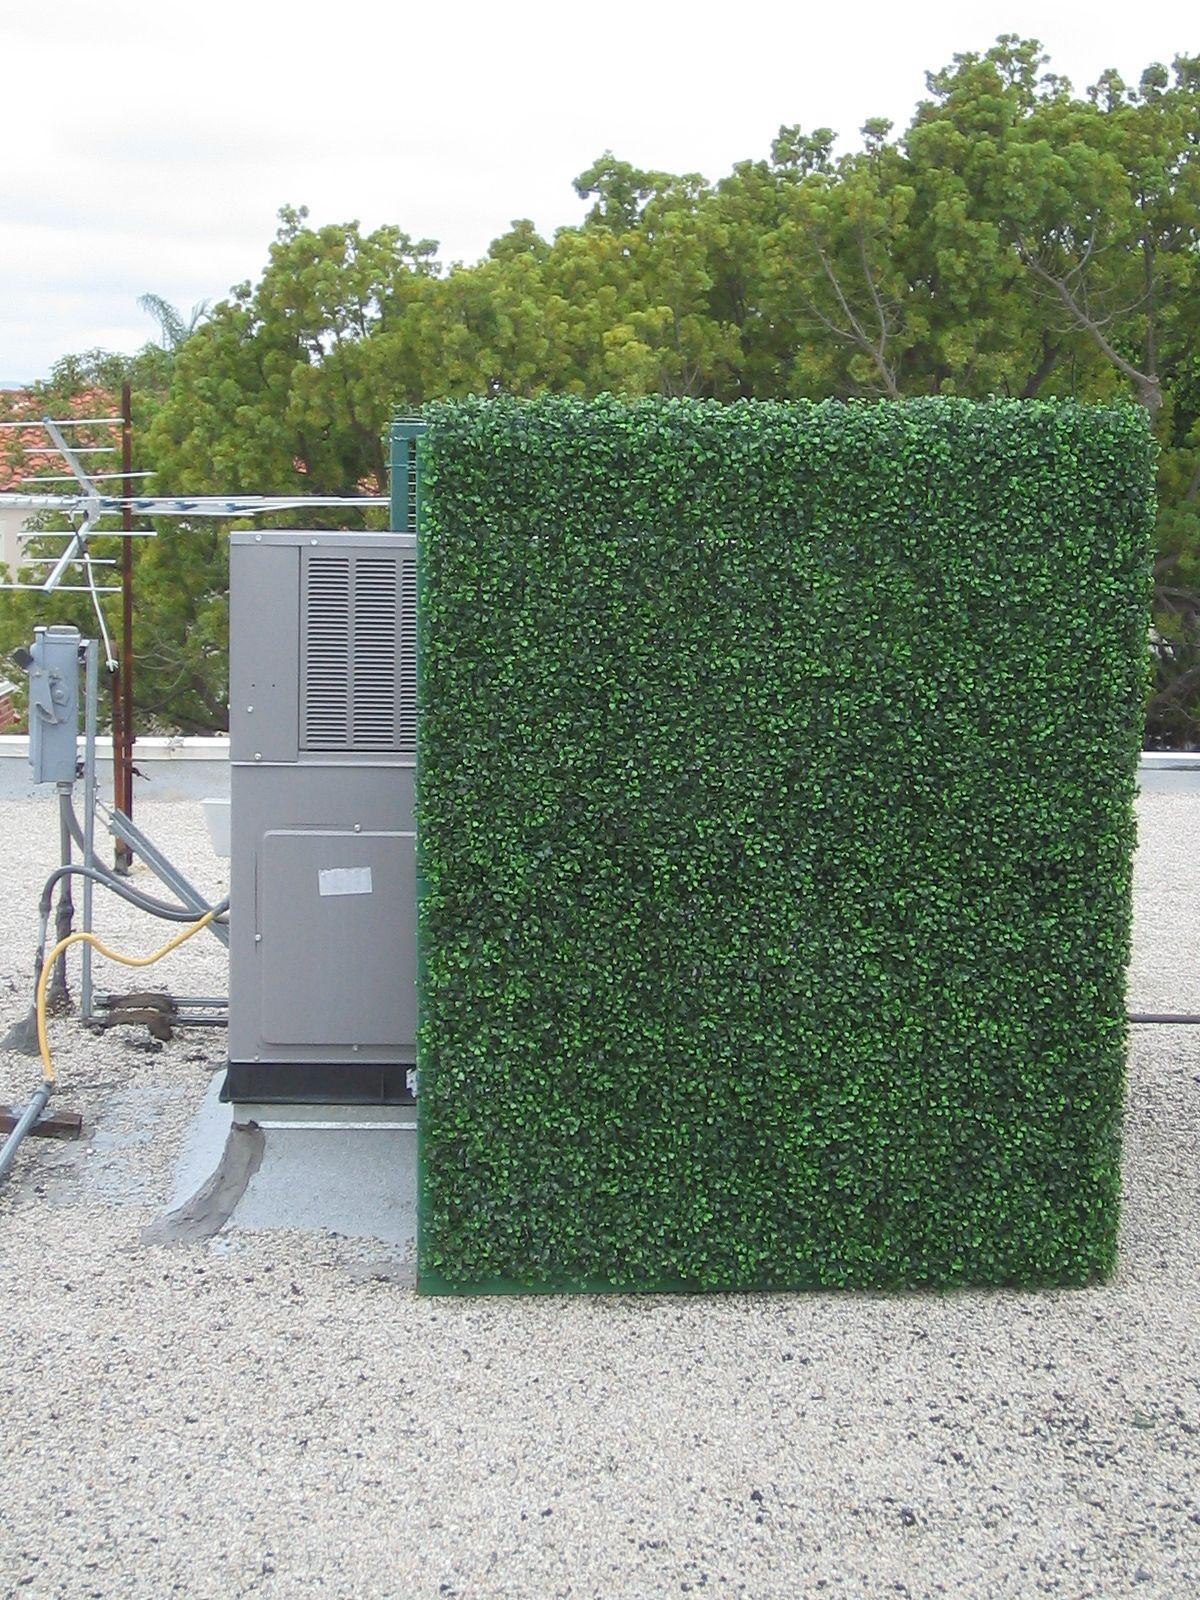 Concealing HVAC equipment on your rooftop has never been